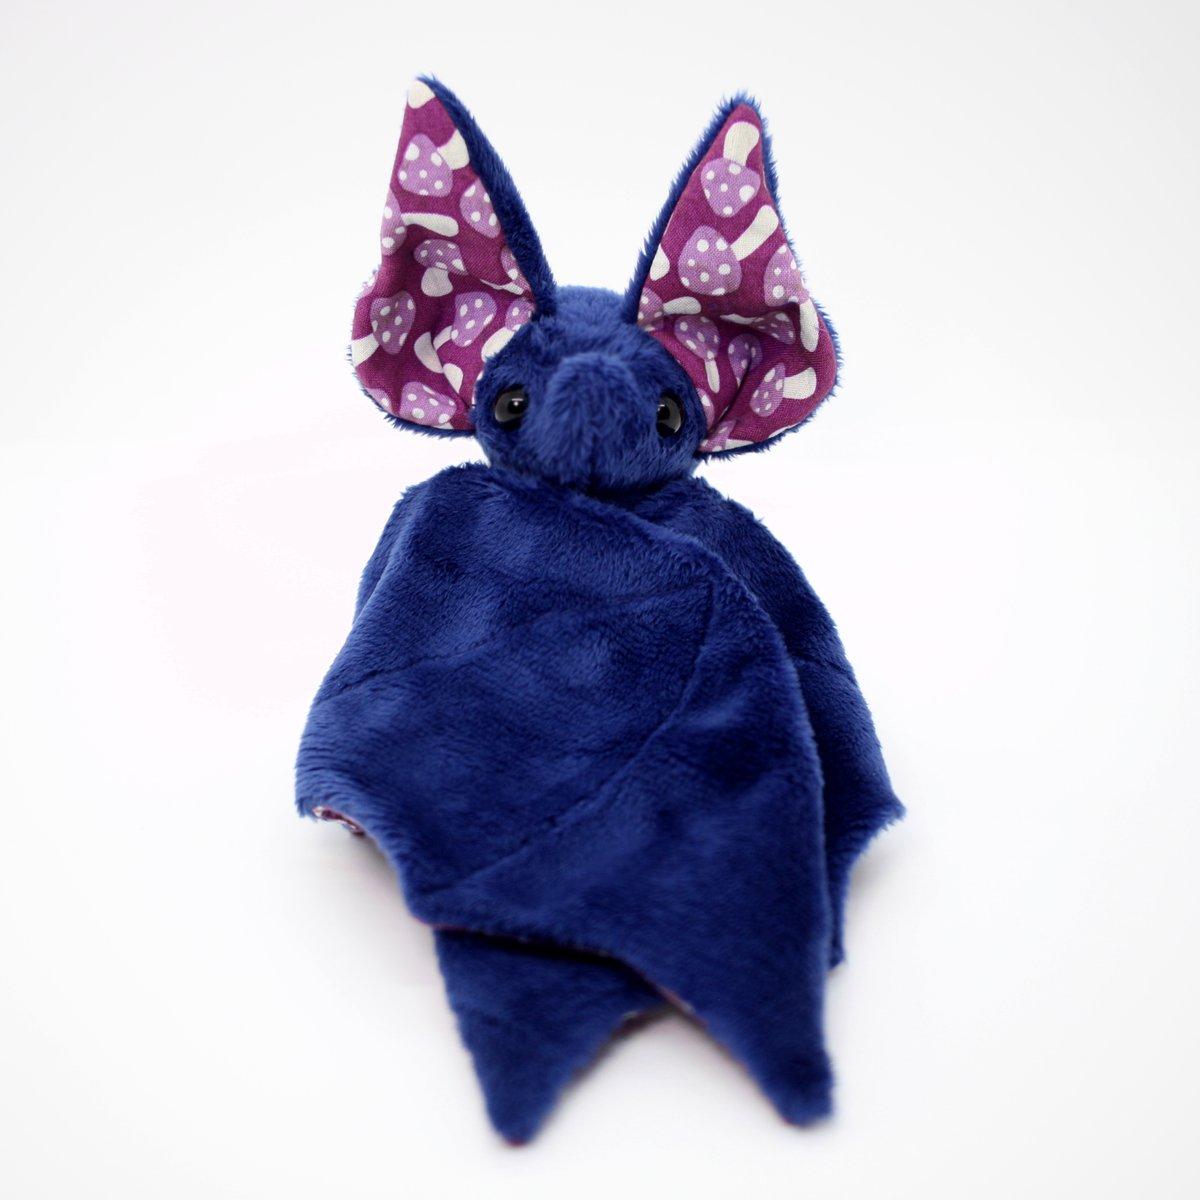 Image of Midnight Blue Poison Mushroom Bat - Made to Order